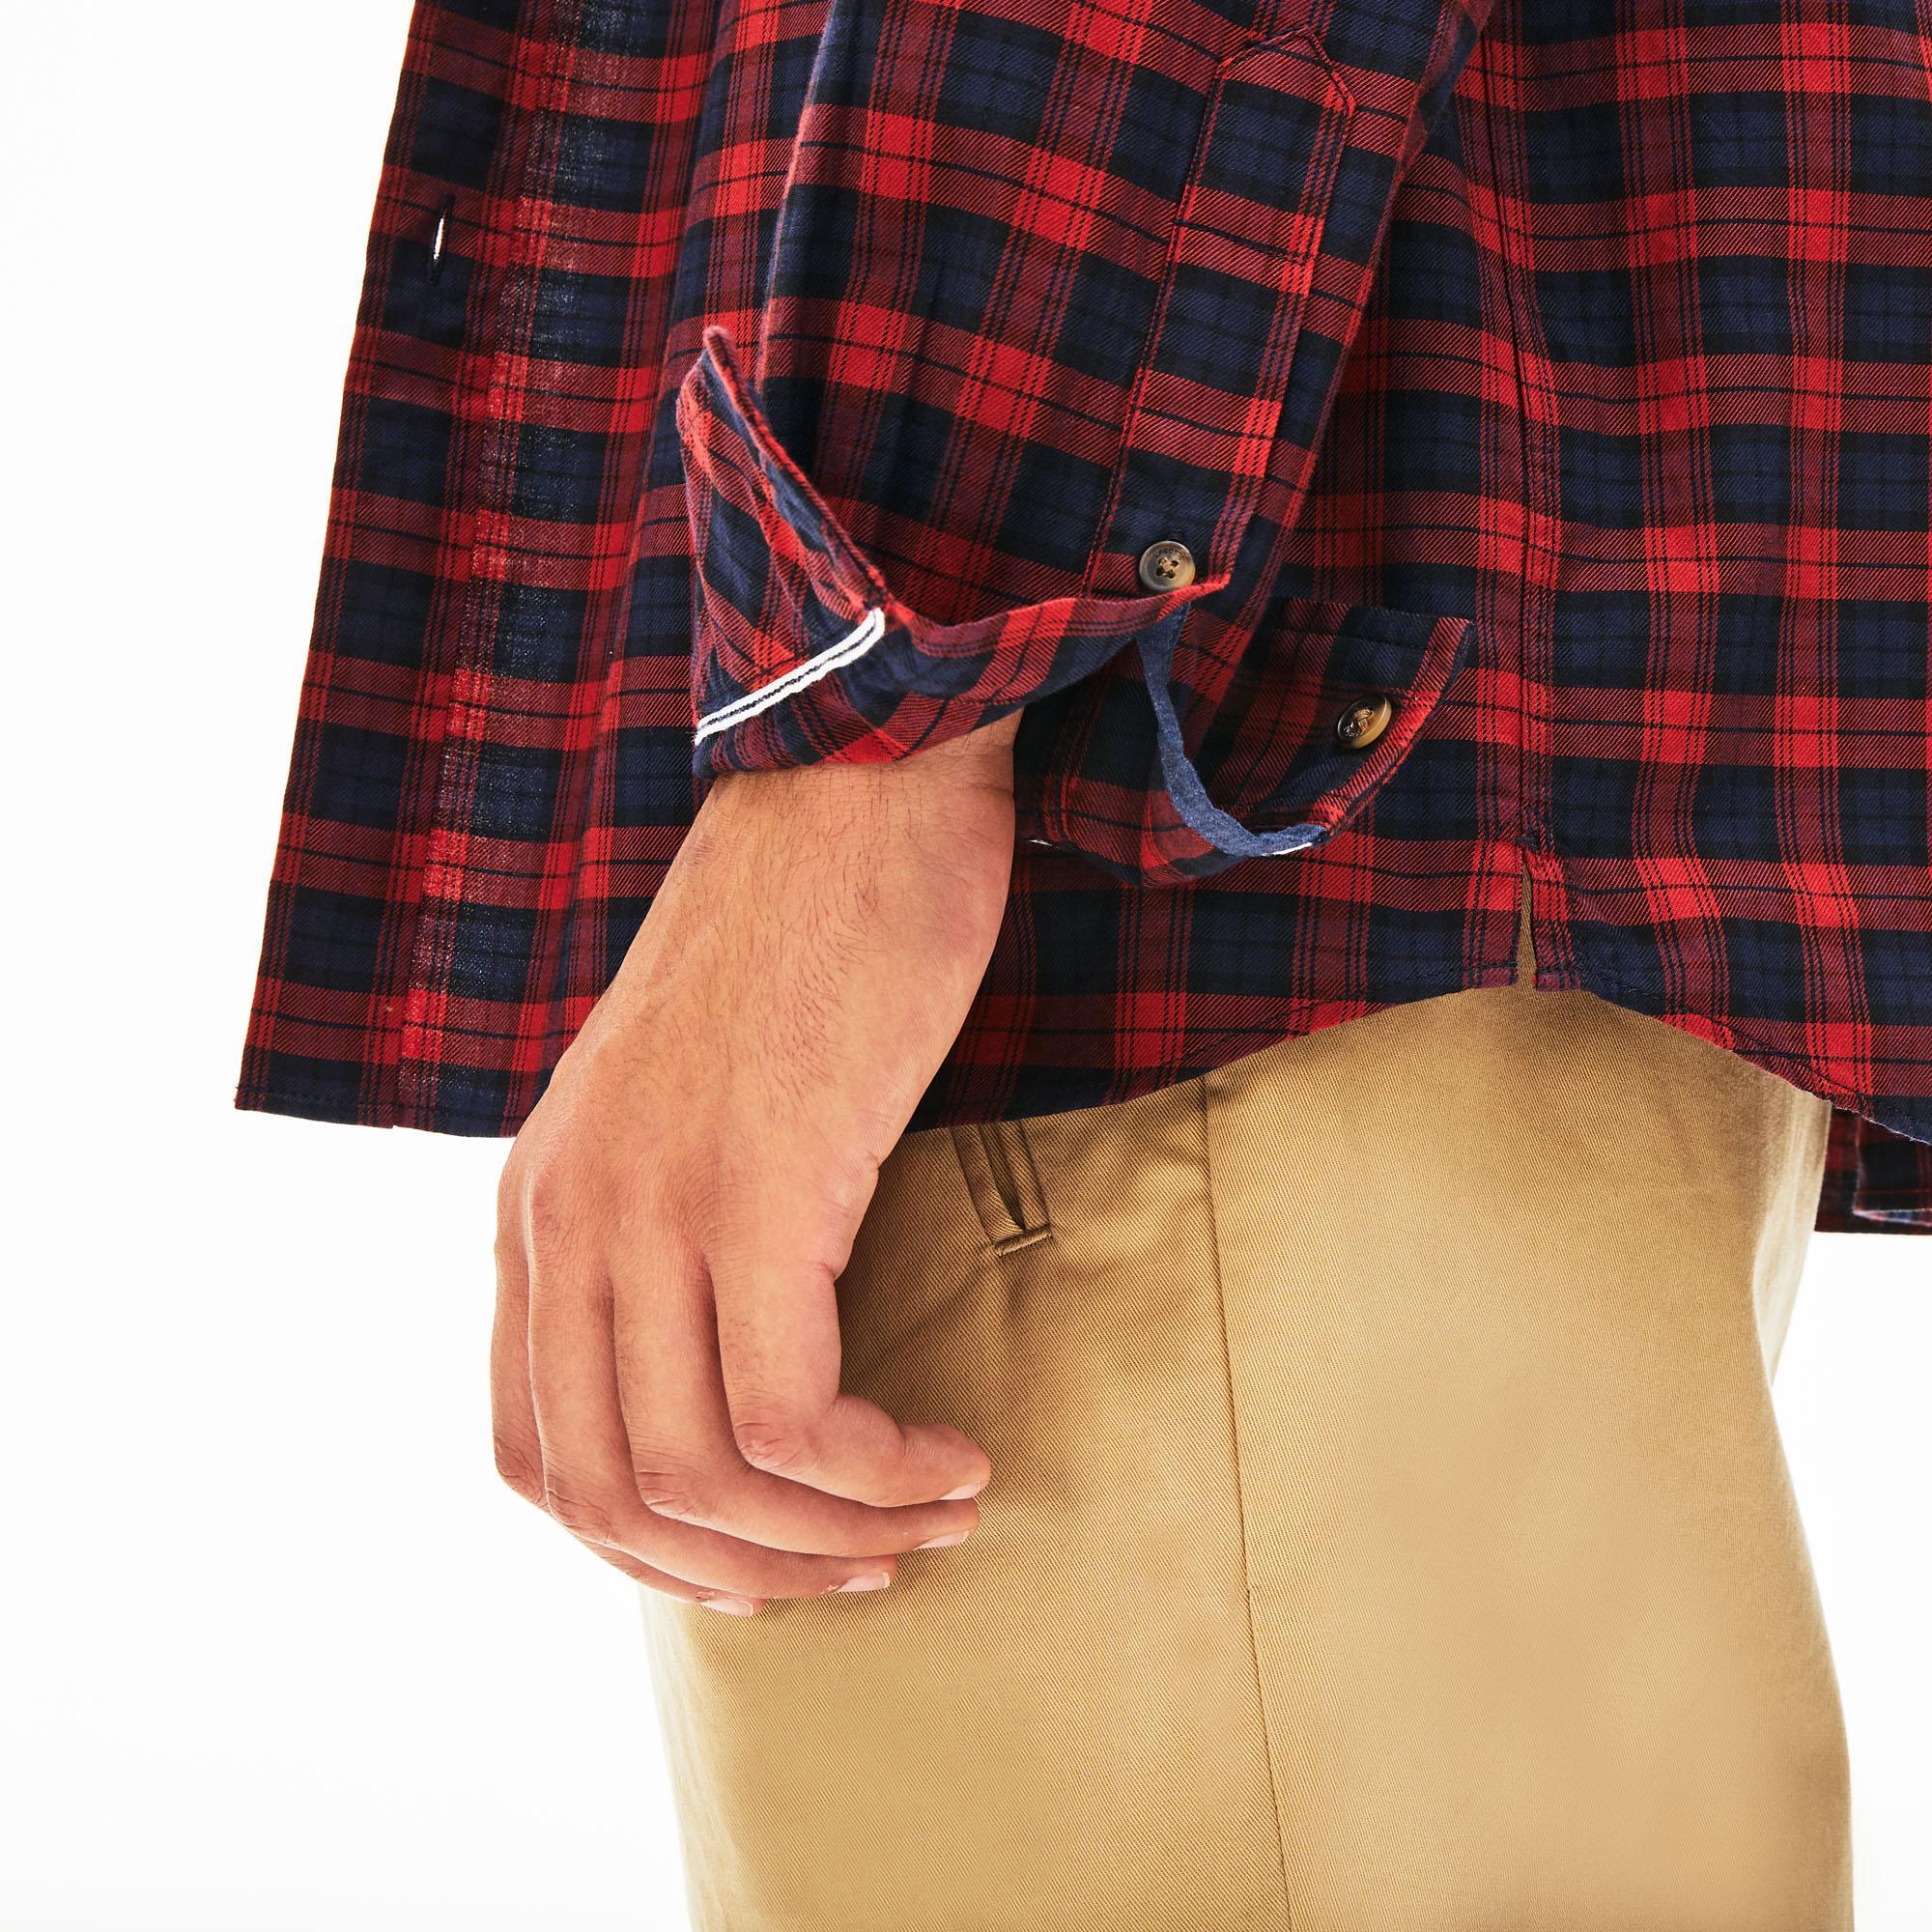 Lacoste Erkek Regular Fit Ekose Desenli Lacivert / Bordo Gömlek